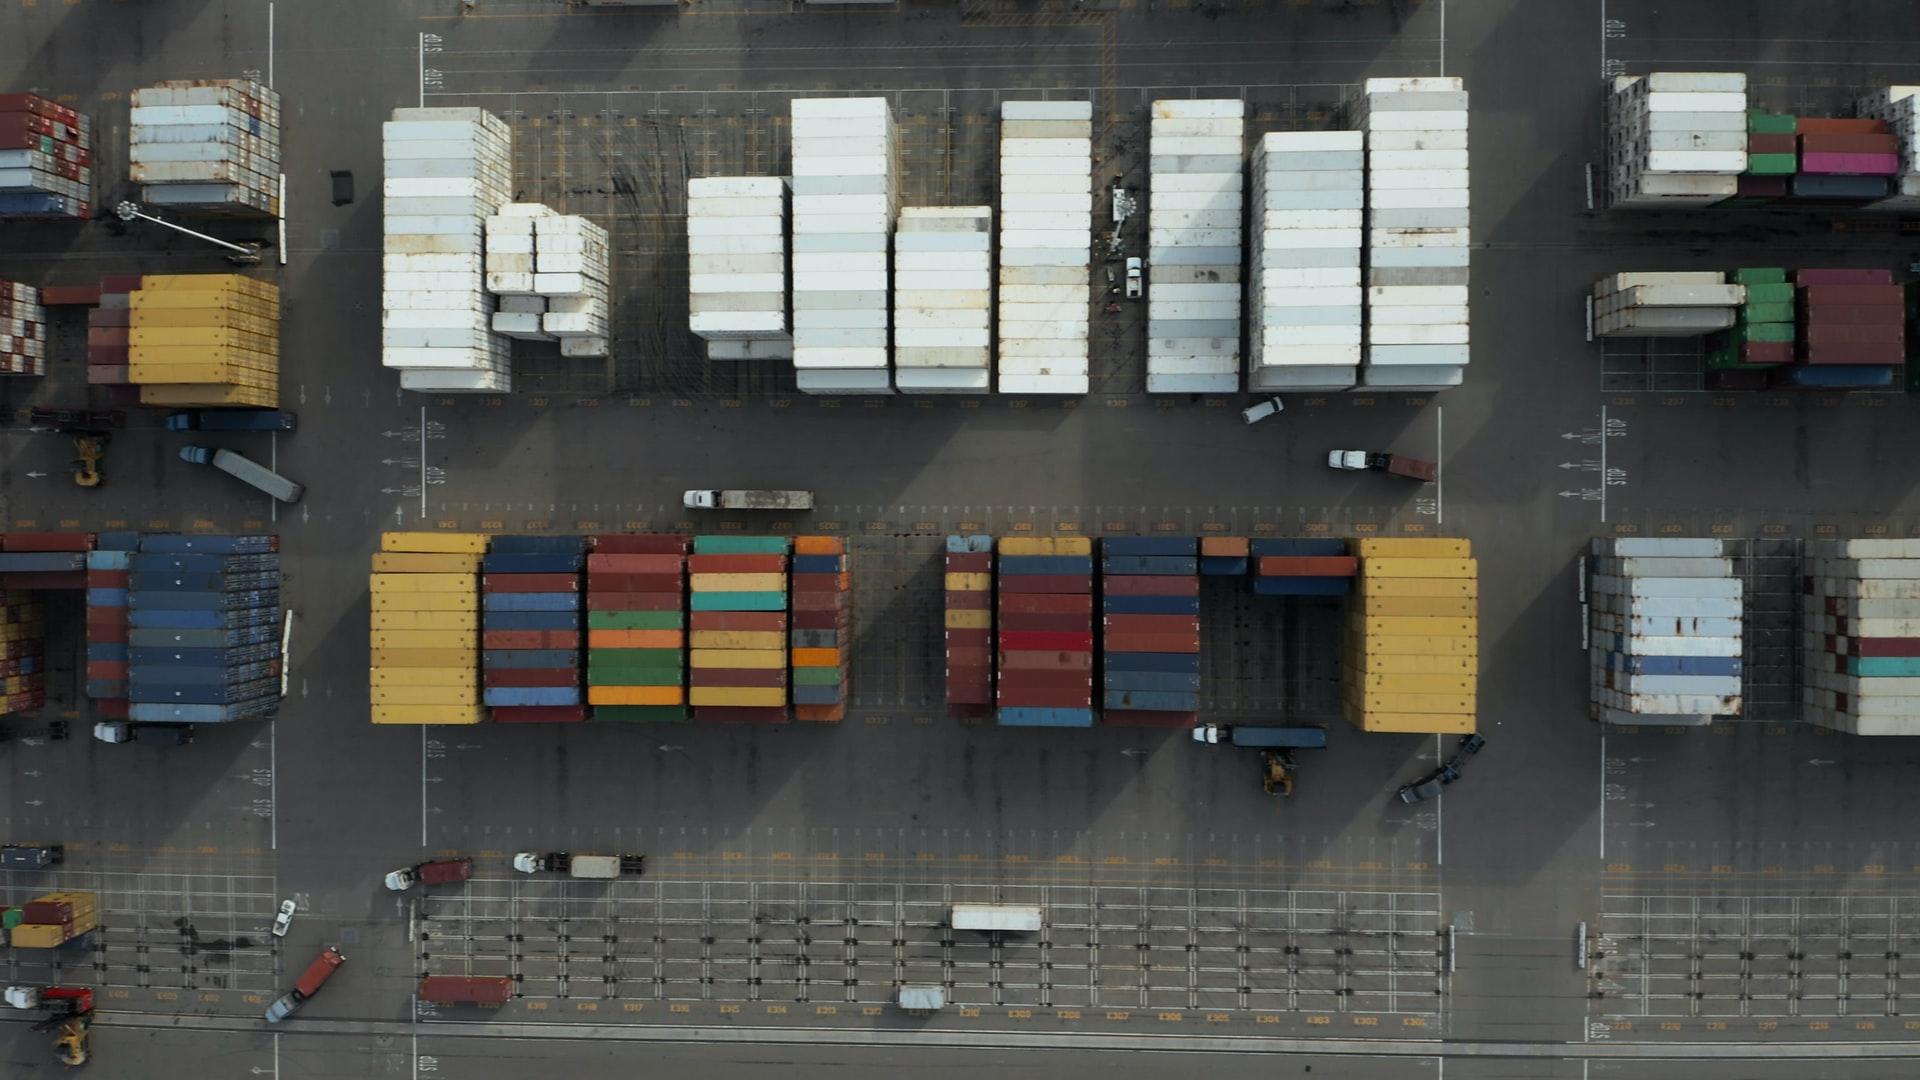 Ekspor Buah RI Meroket Selama Pandemi, Tembus Pasar China hingga Arab Saudi